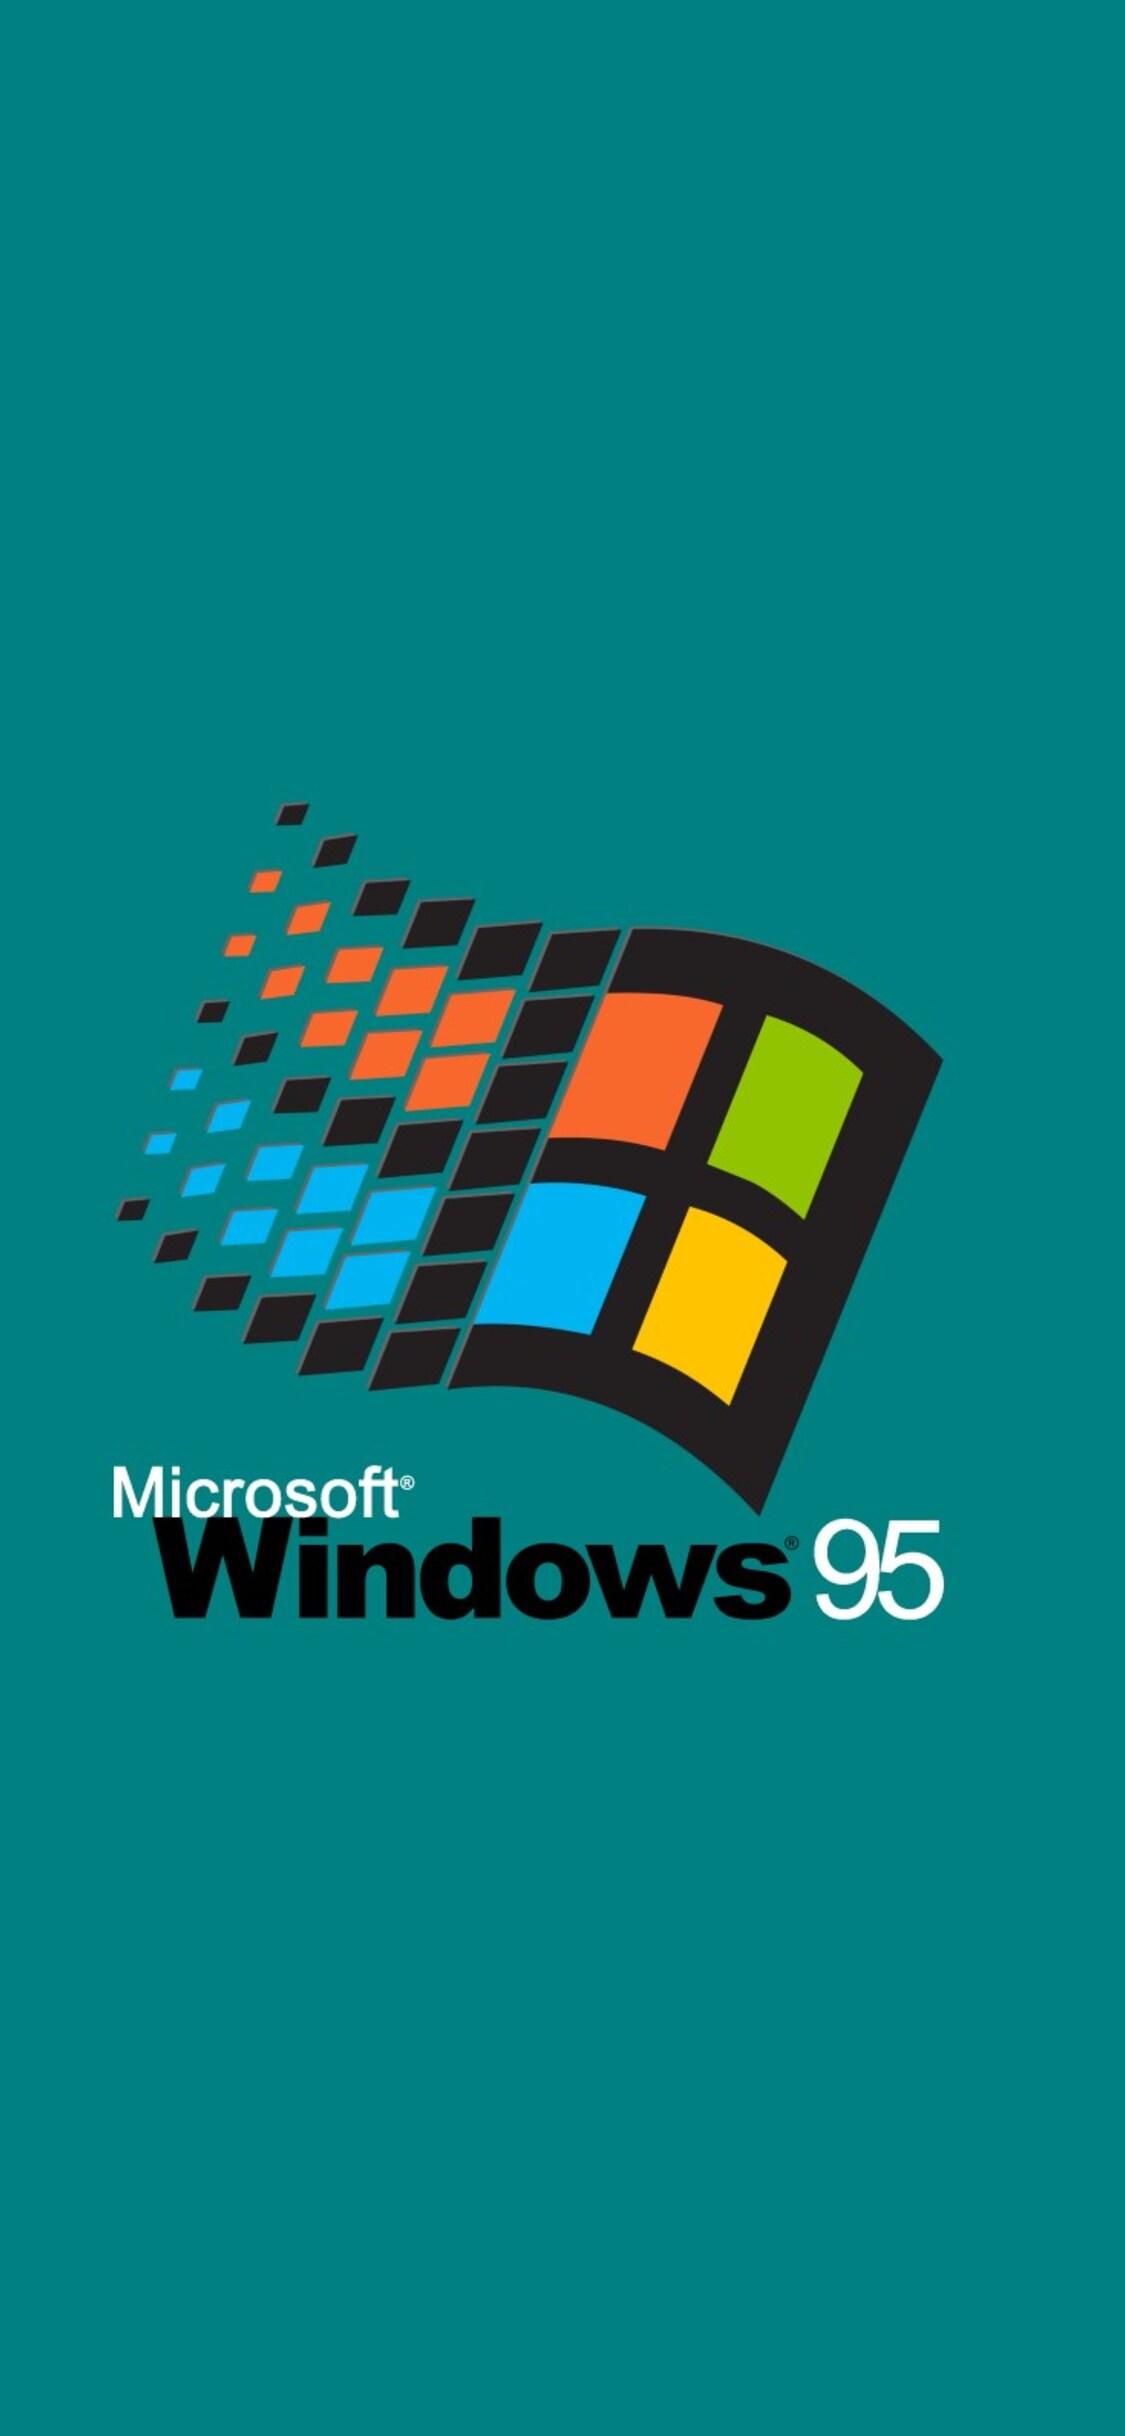 Windows  Iphone Xsiphone Iphone X